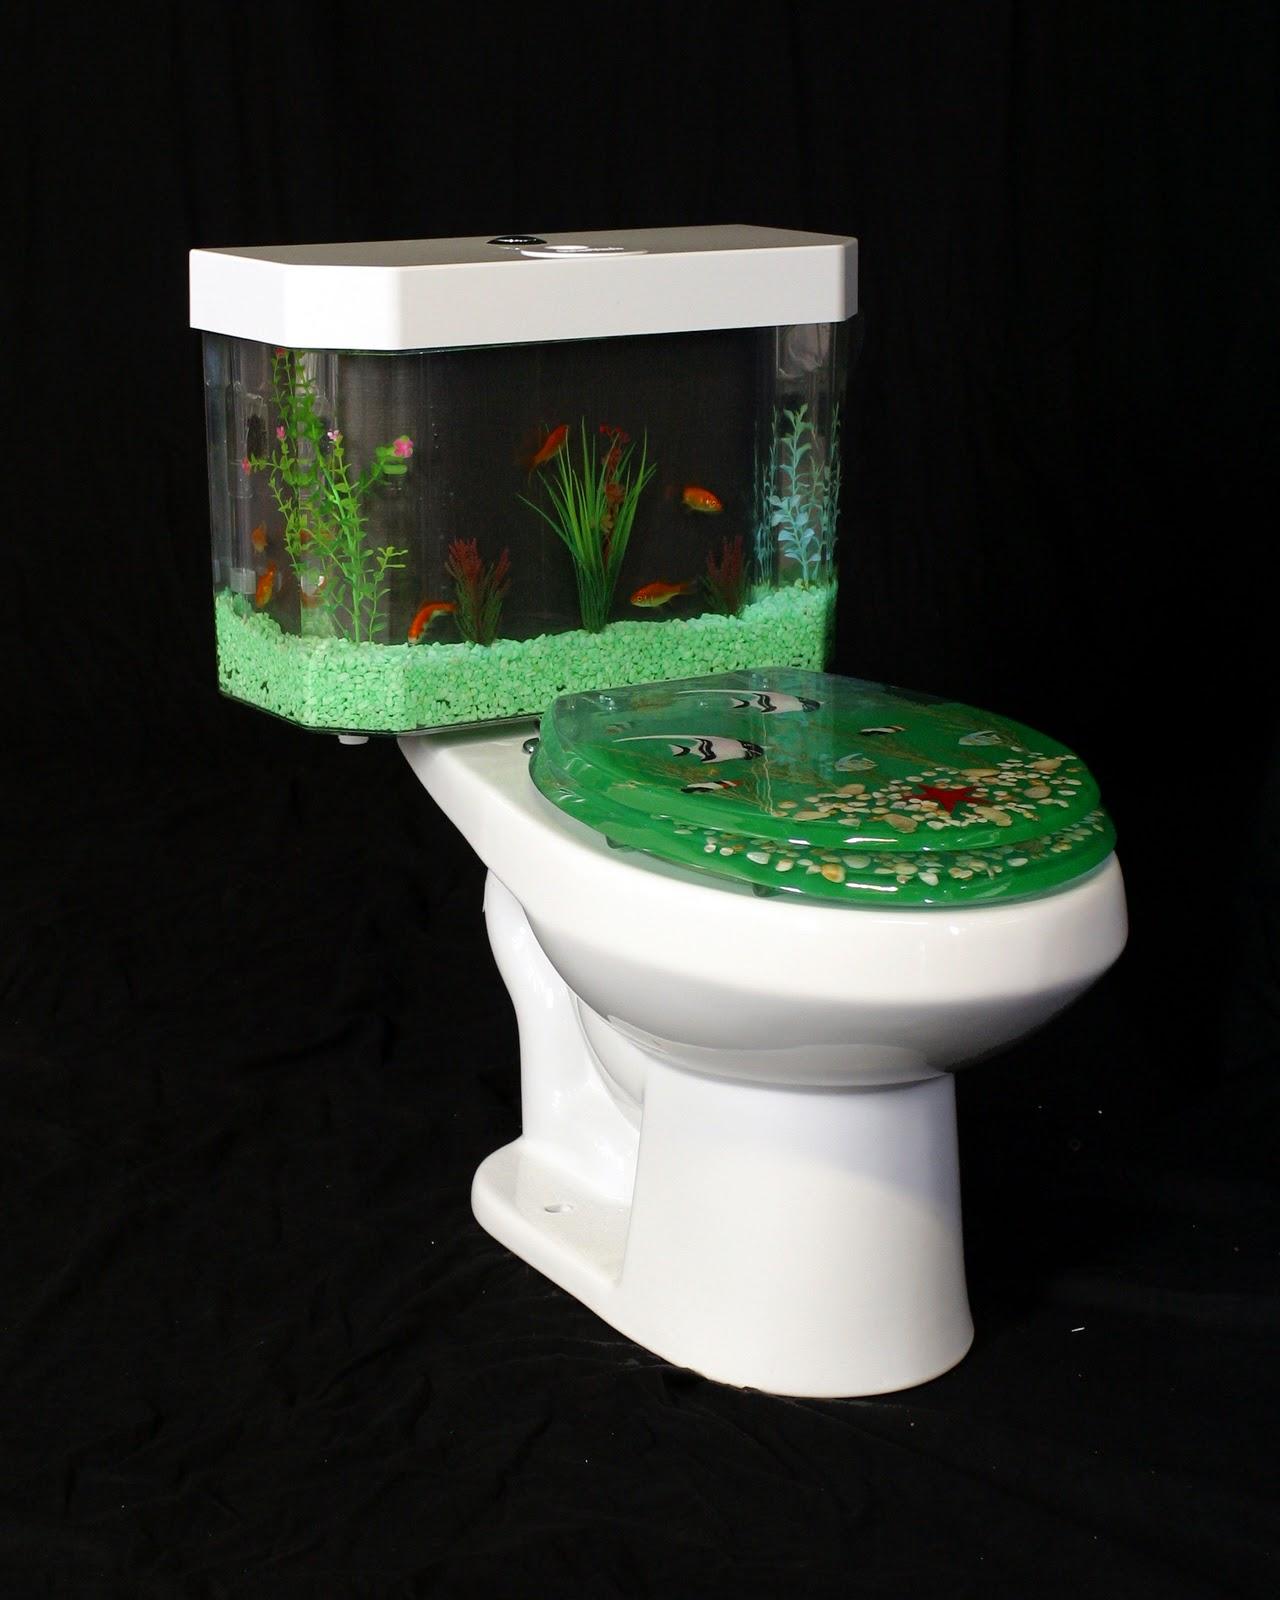 #653F25 365 dias com a Villa Pano: Fish n Flush  1280x1600 px sonhar banheiro grande